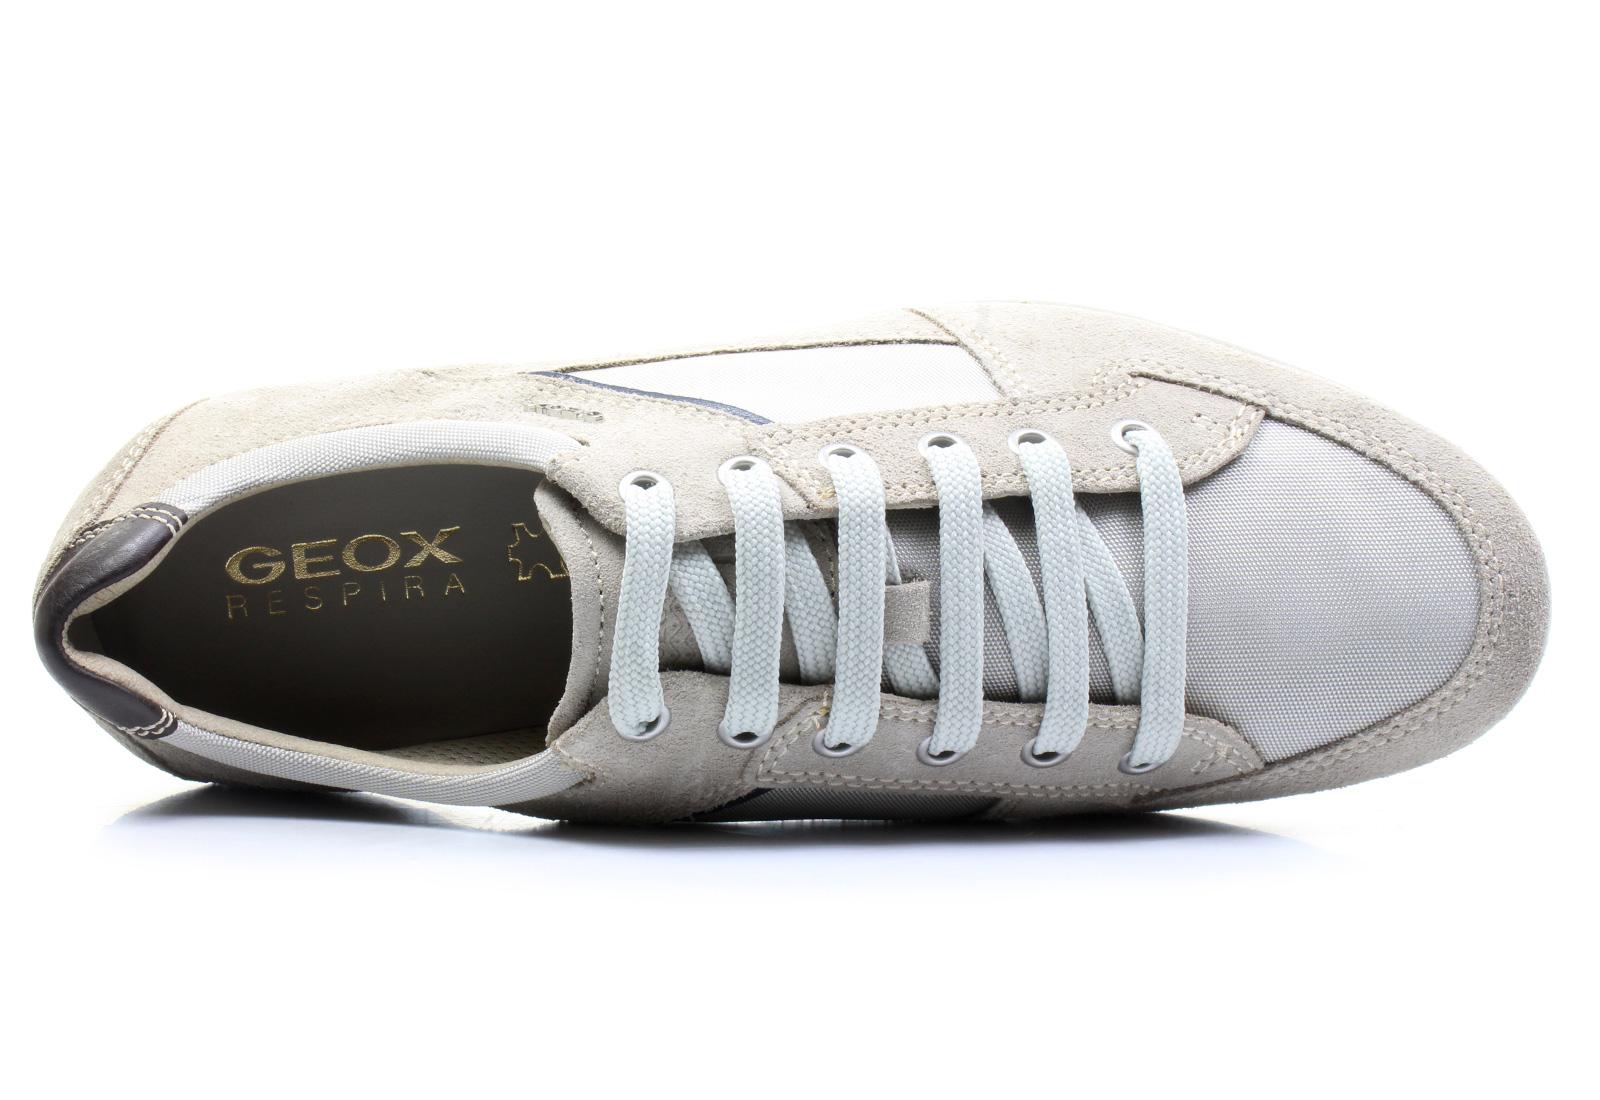 Geox Topánky - Symbol - A5A-2211-1701 - Tenisky a9578a2150